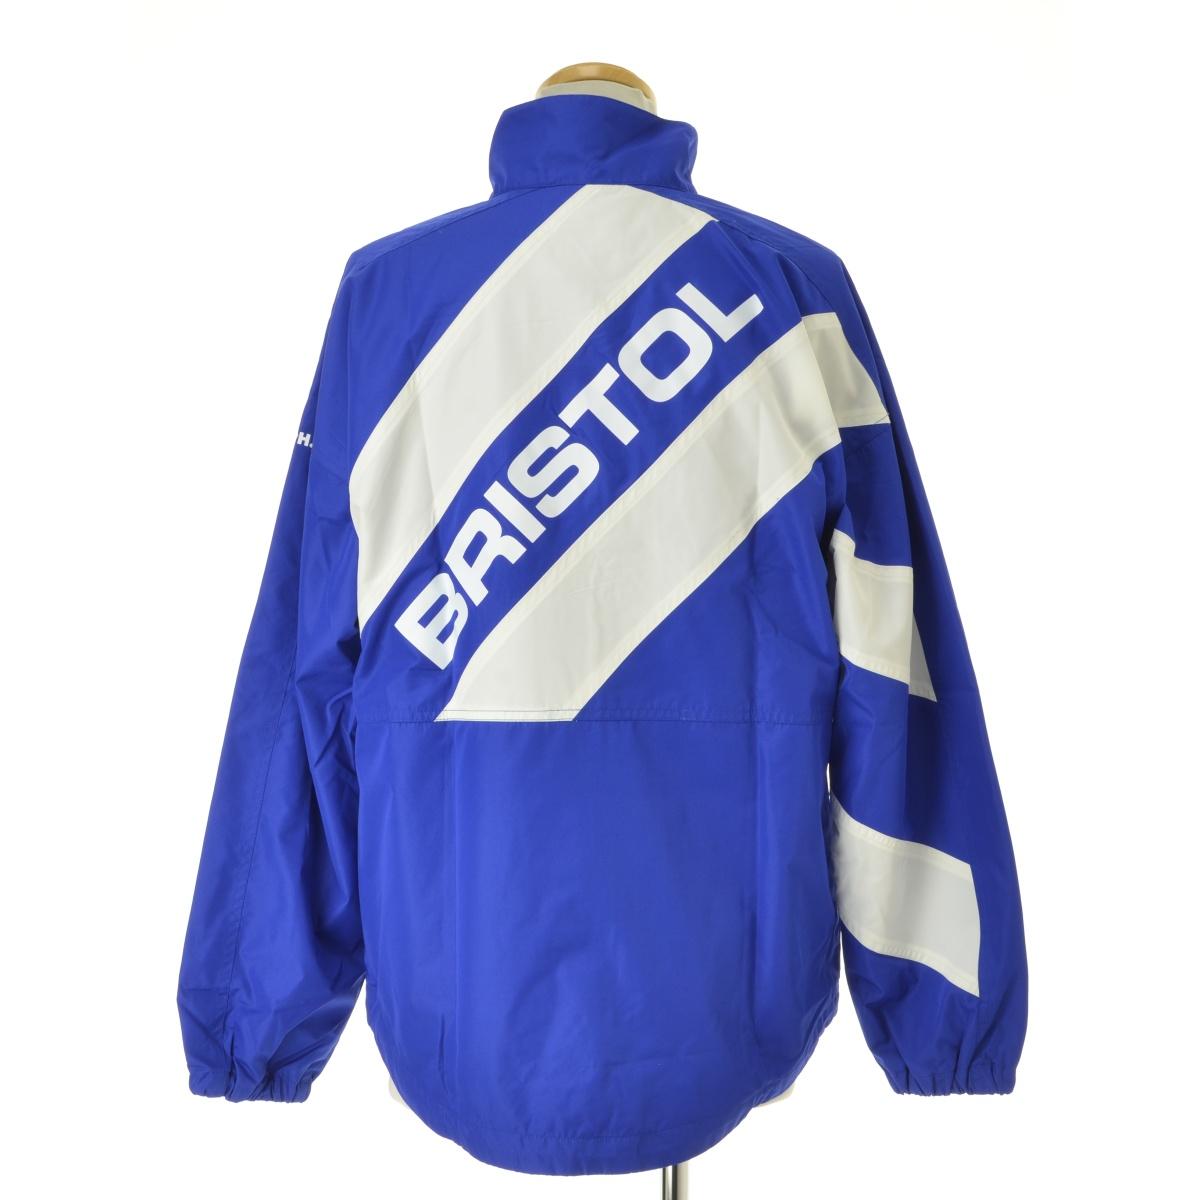 F.C.R.B. / エフシーアールビーの古着「17AW FCRB-178004 STAND COLLAR STRIPE JACKETジャケット」|詳細画像